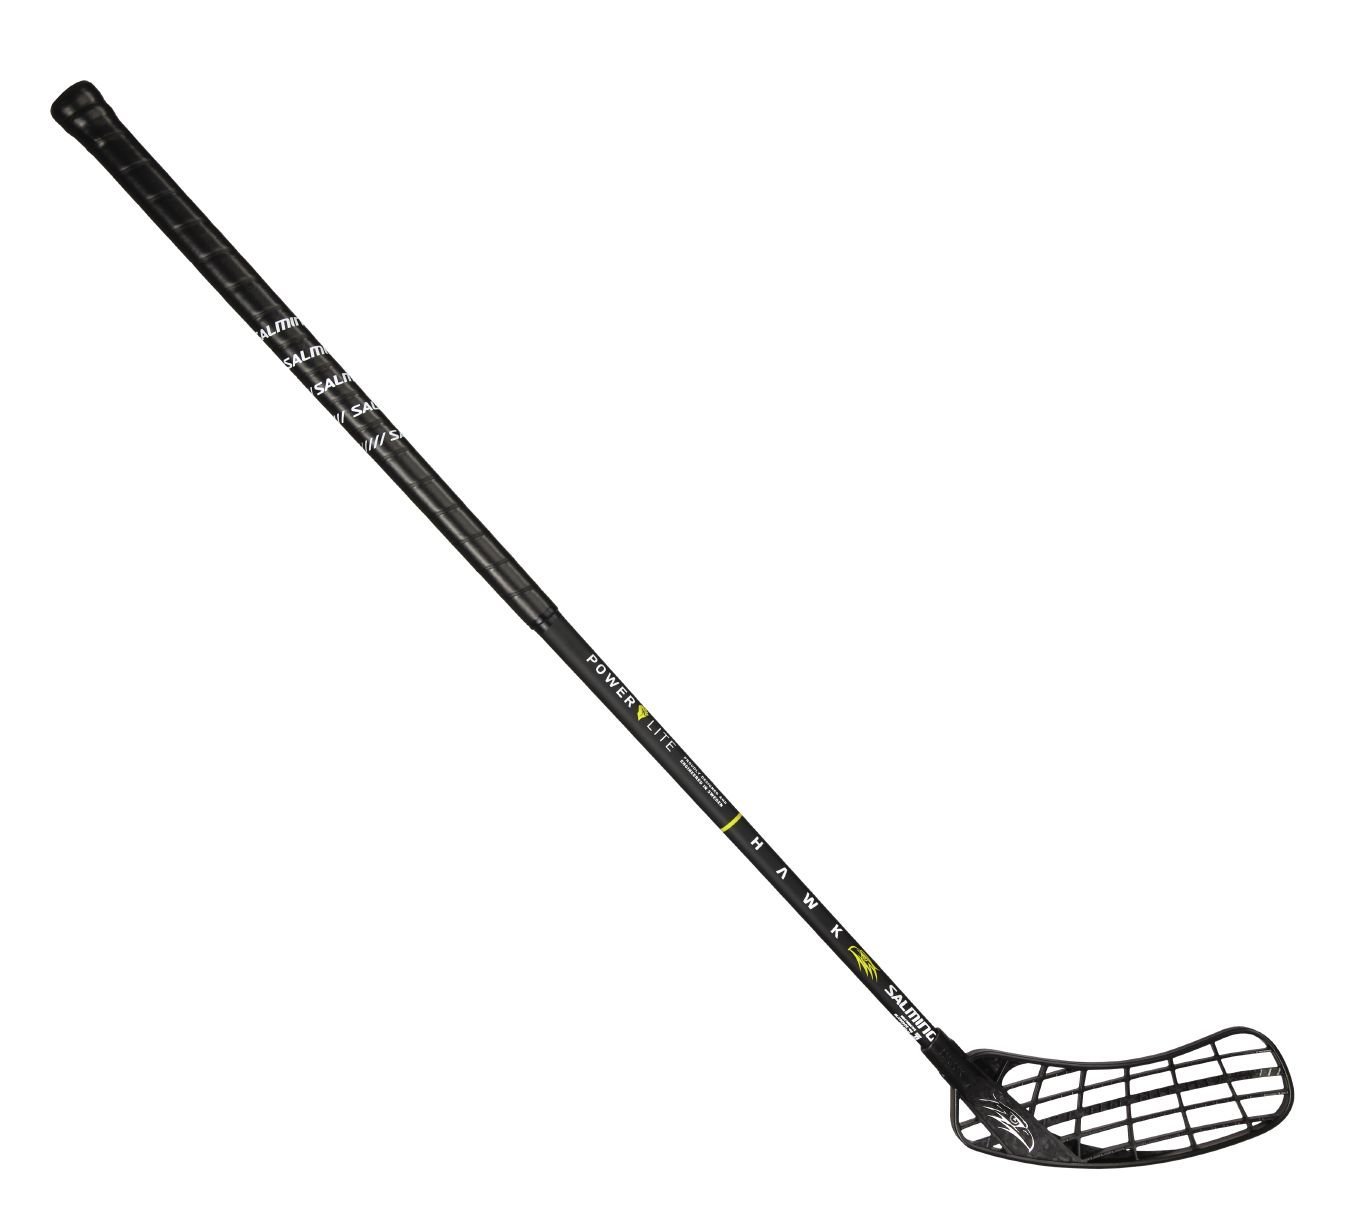 Salming Hawk PowerLite Oval KickZone 25 100 (111 cm) - pravá